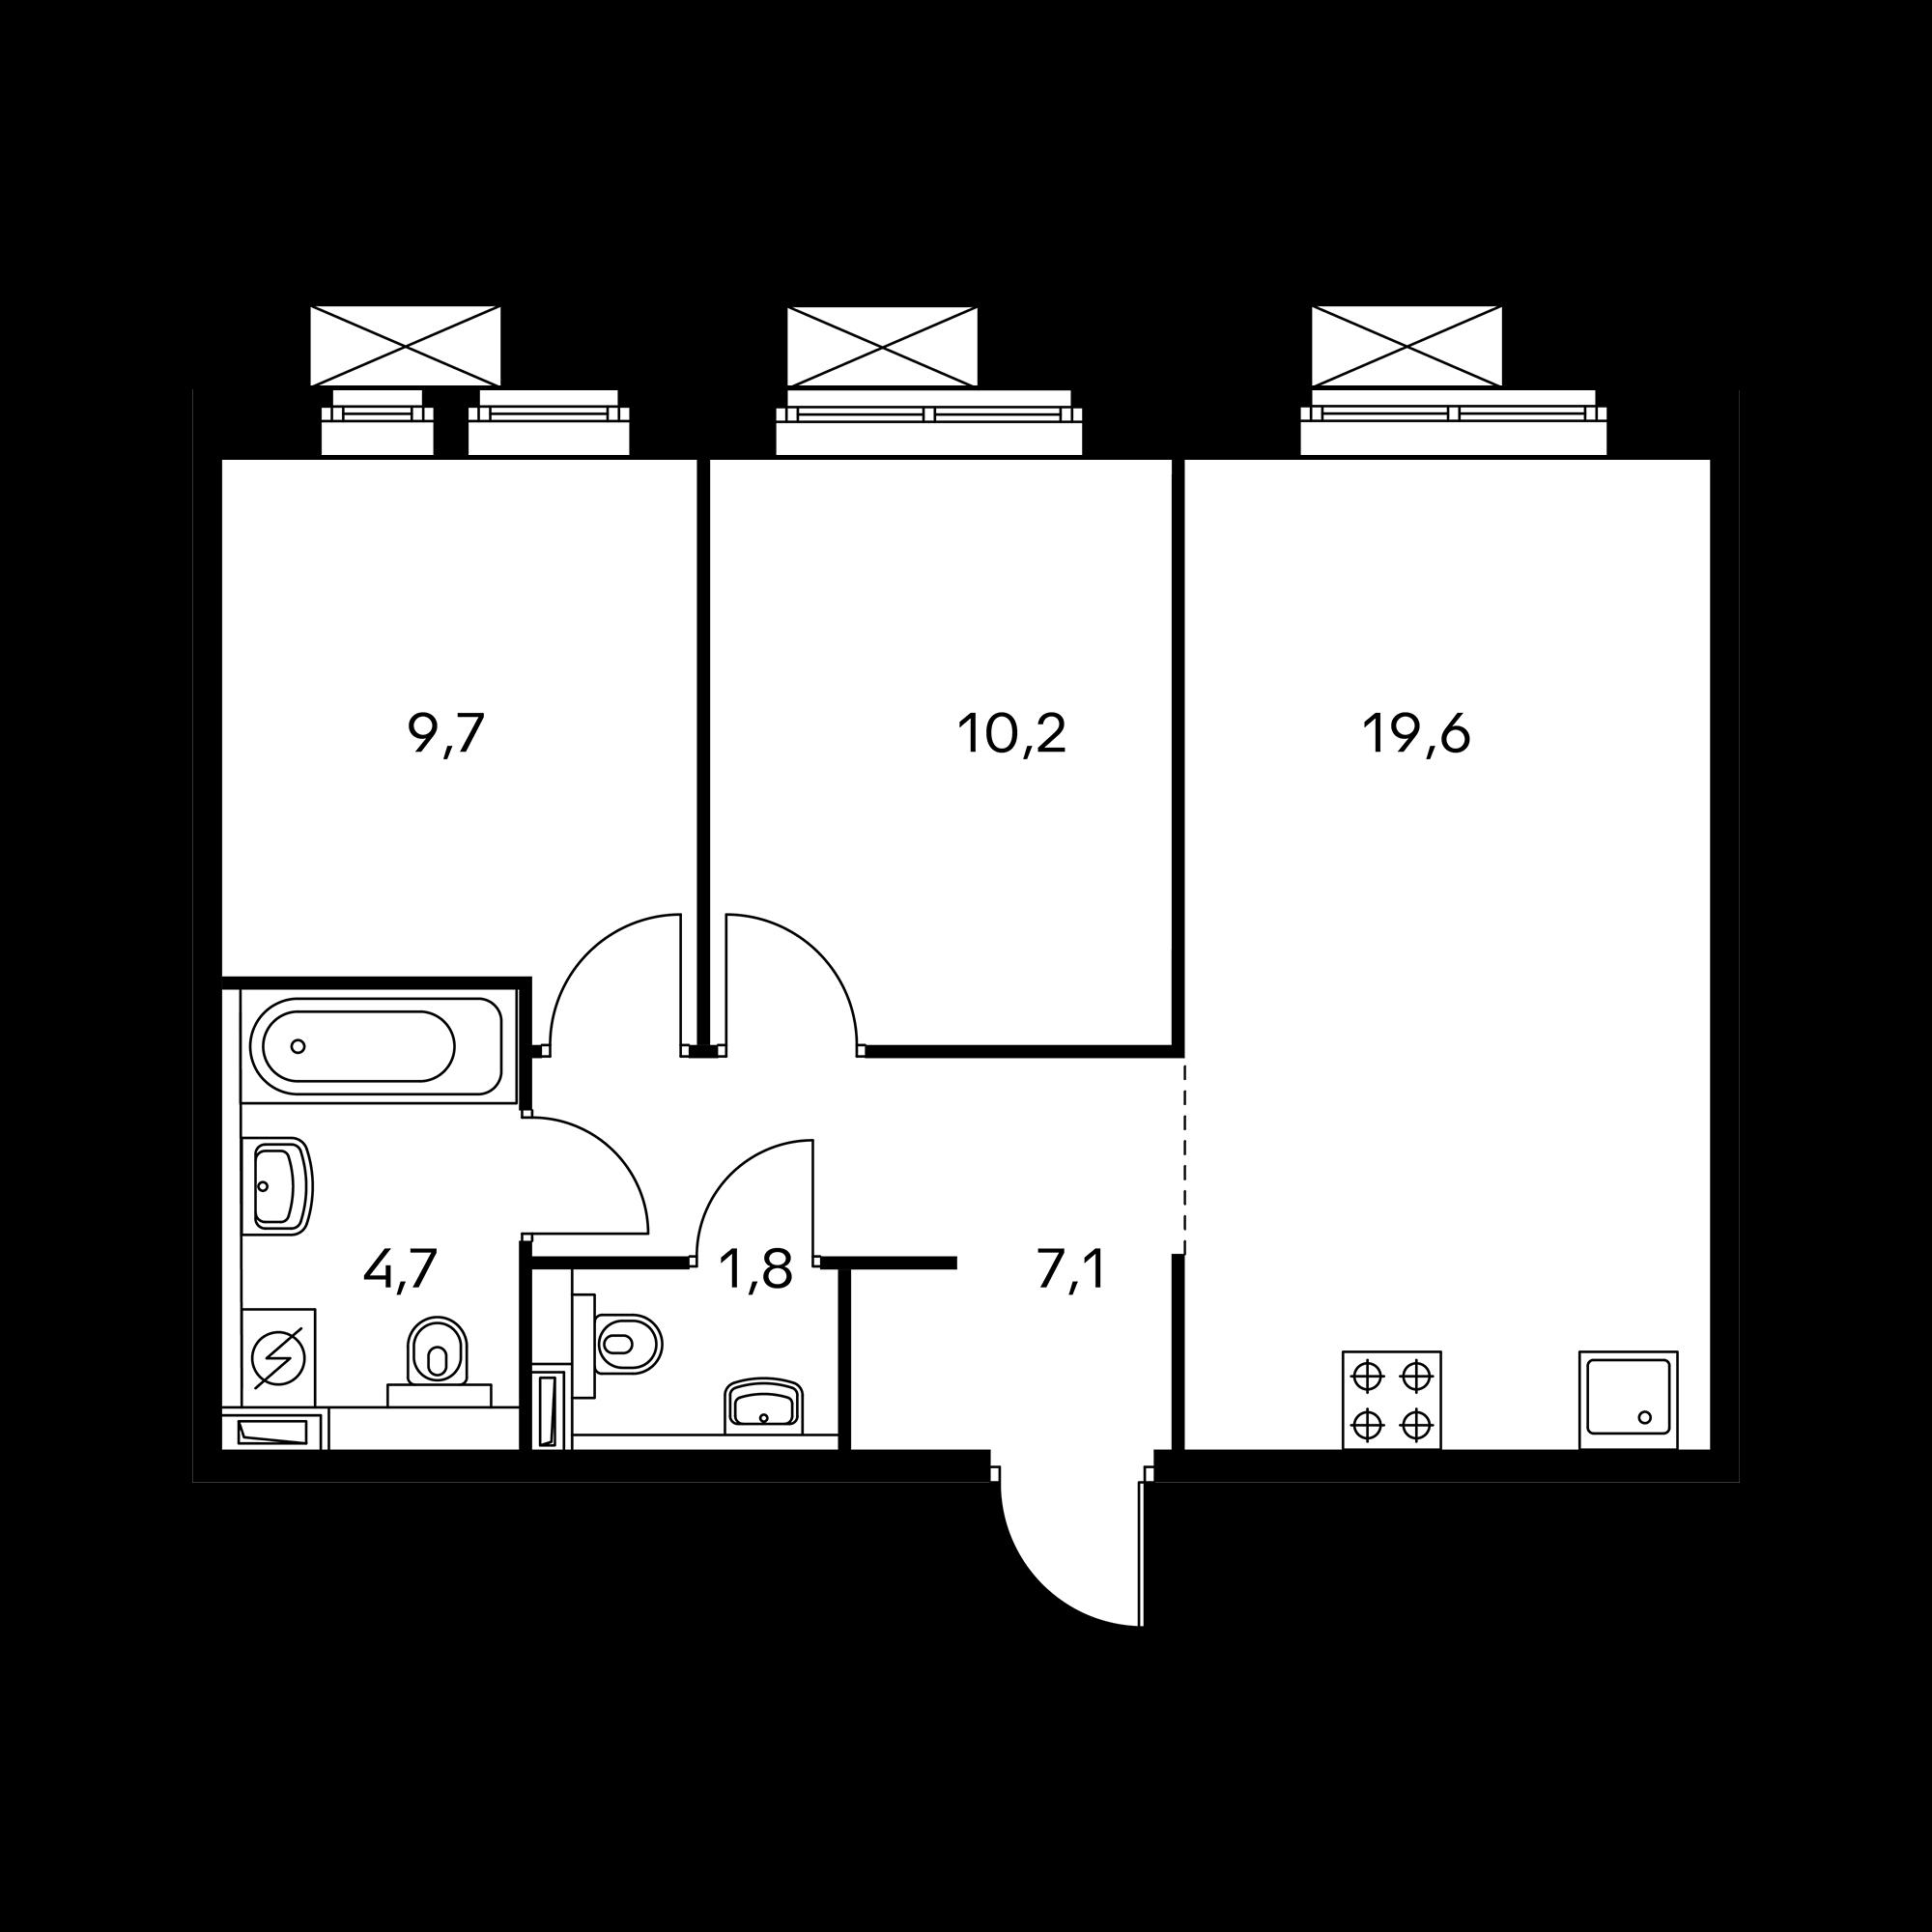 2ES9_9.3-1_2*